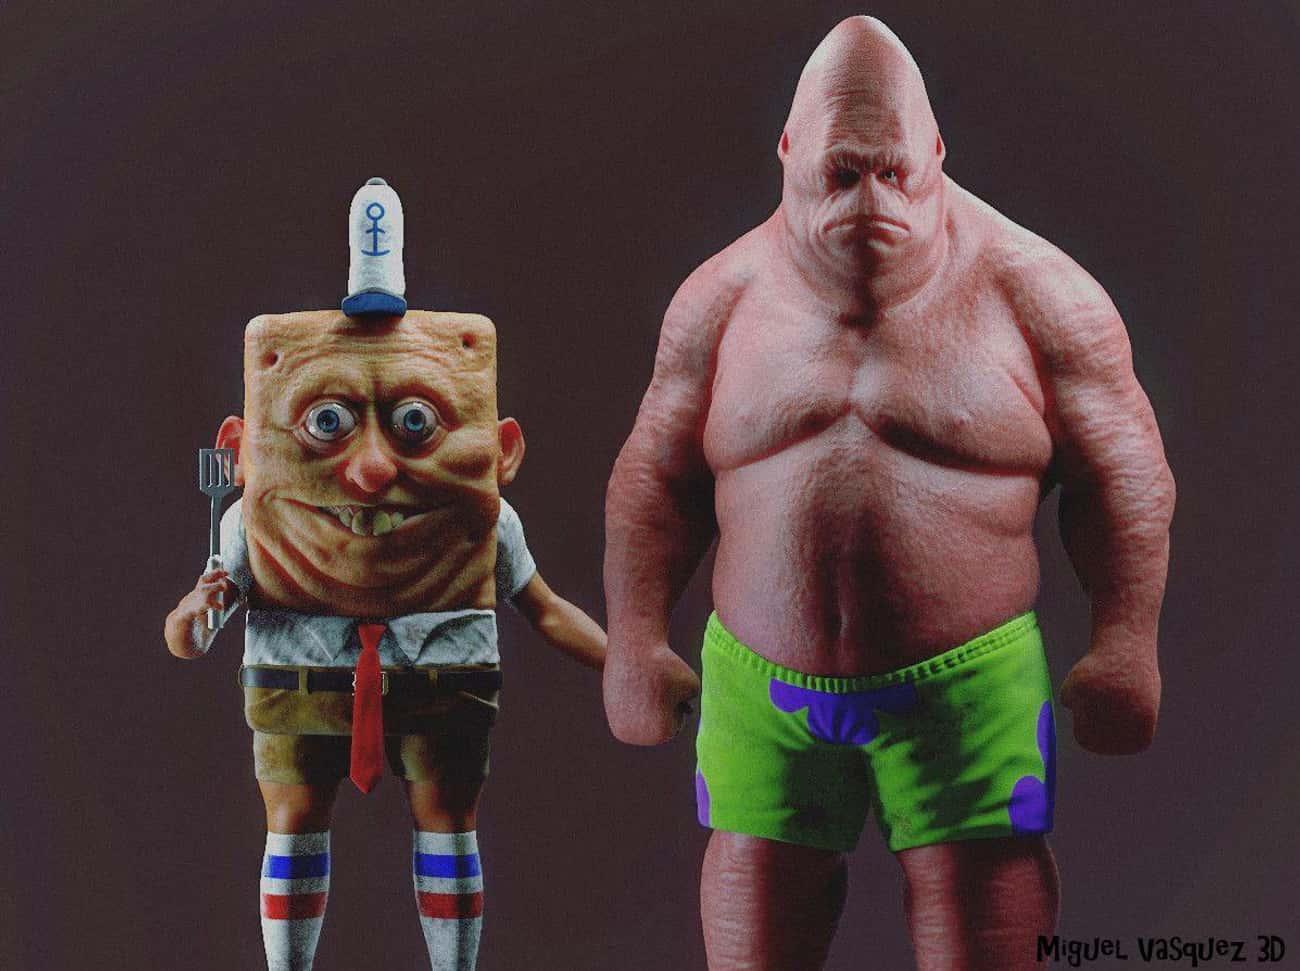 Spongebob In The Flesh: Terror Has A New Face